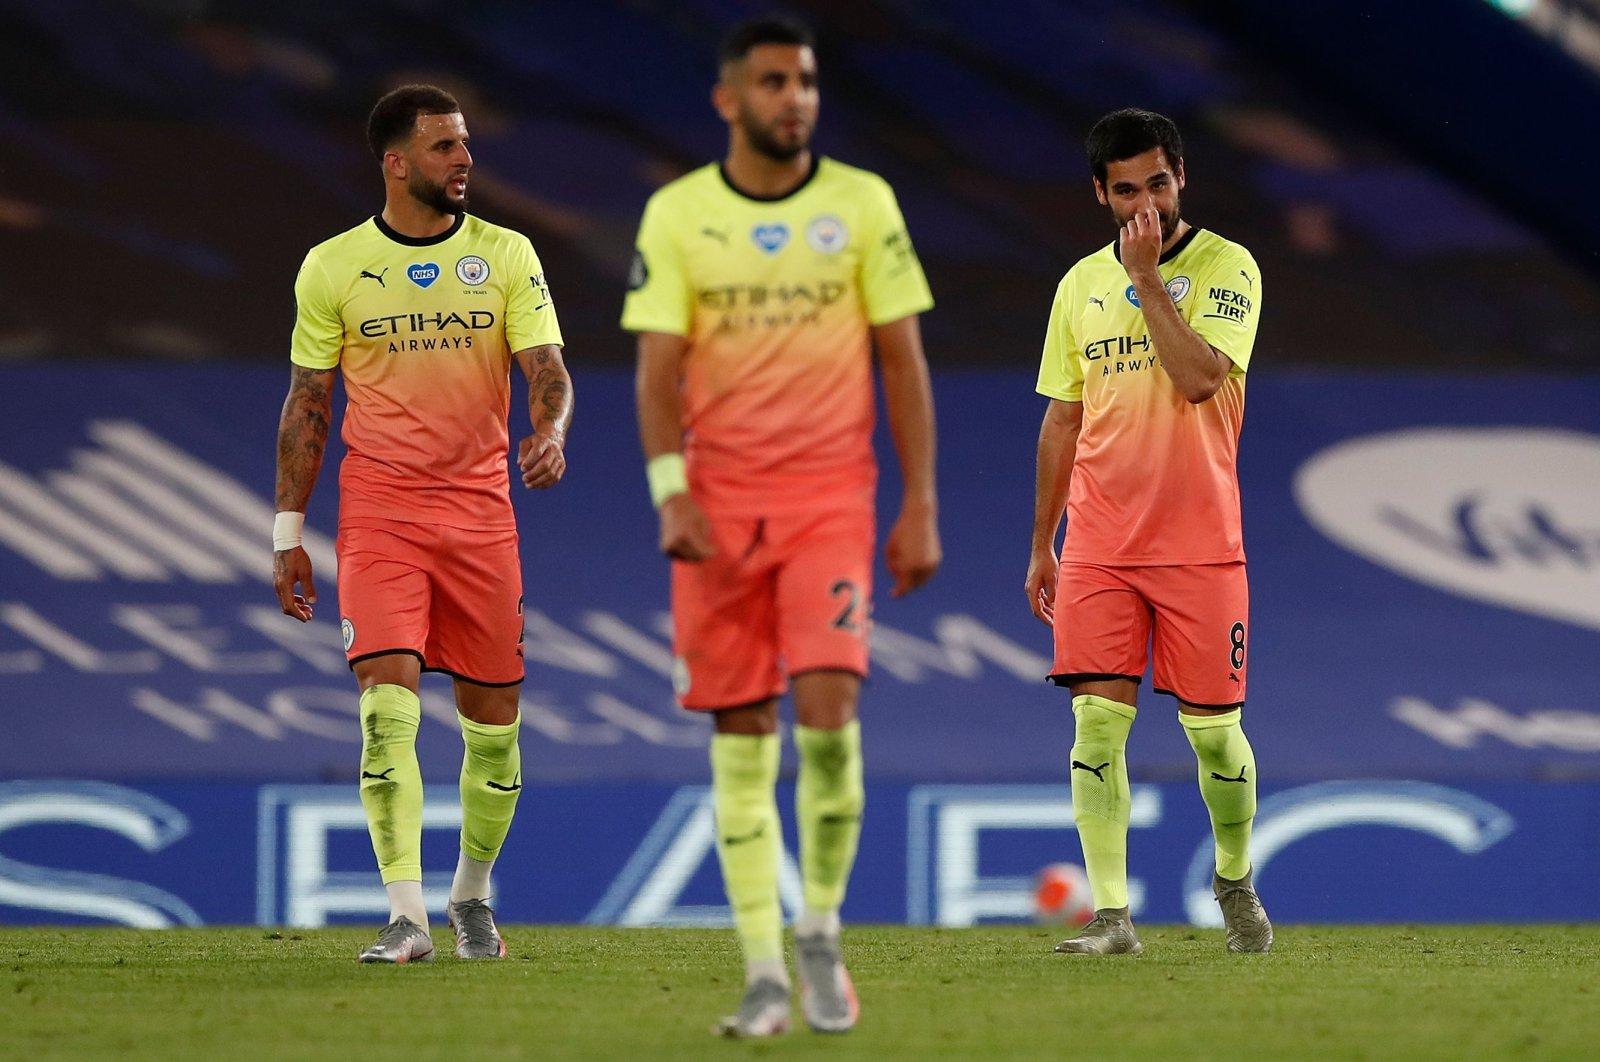 Manchester City's Kyle Walker (L) and midfielder Ilkay Gündoğan (R) react after Chelsea's goal during the Premier League match, London, Britain, June 25, 2020. (AFP Photo)